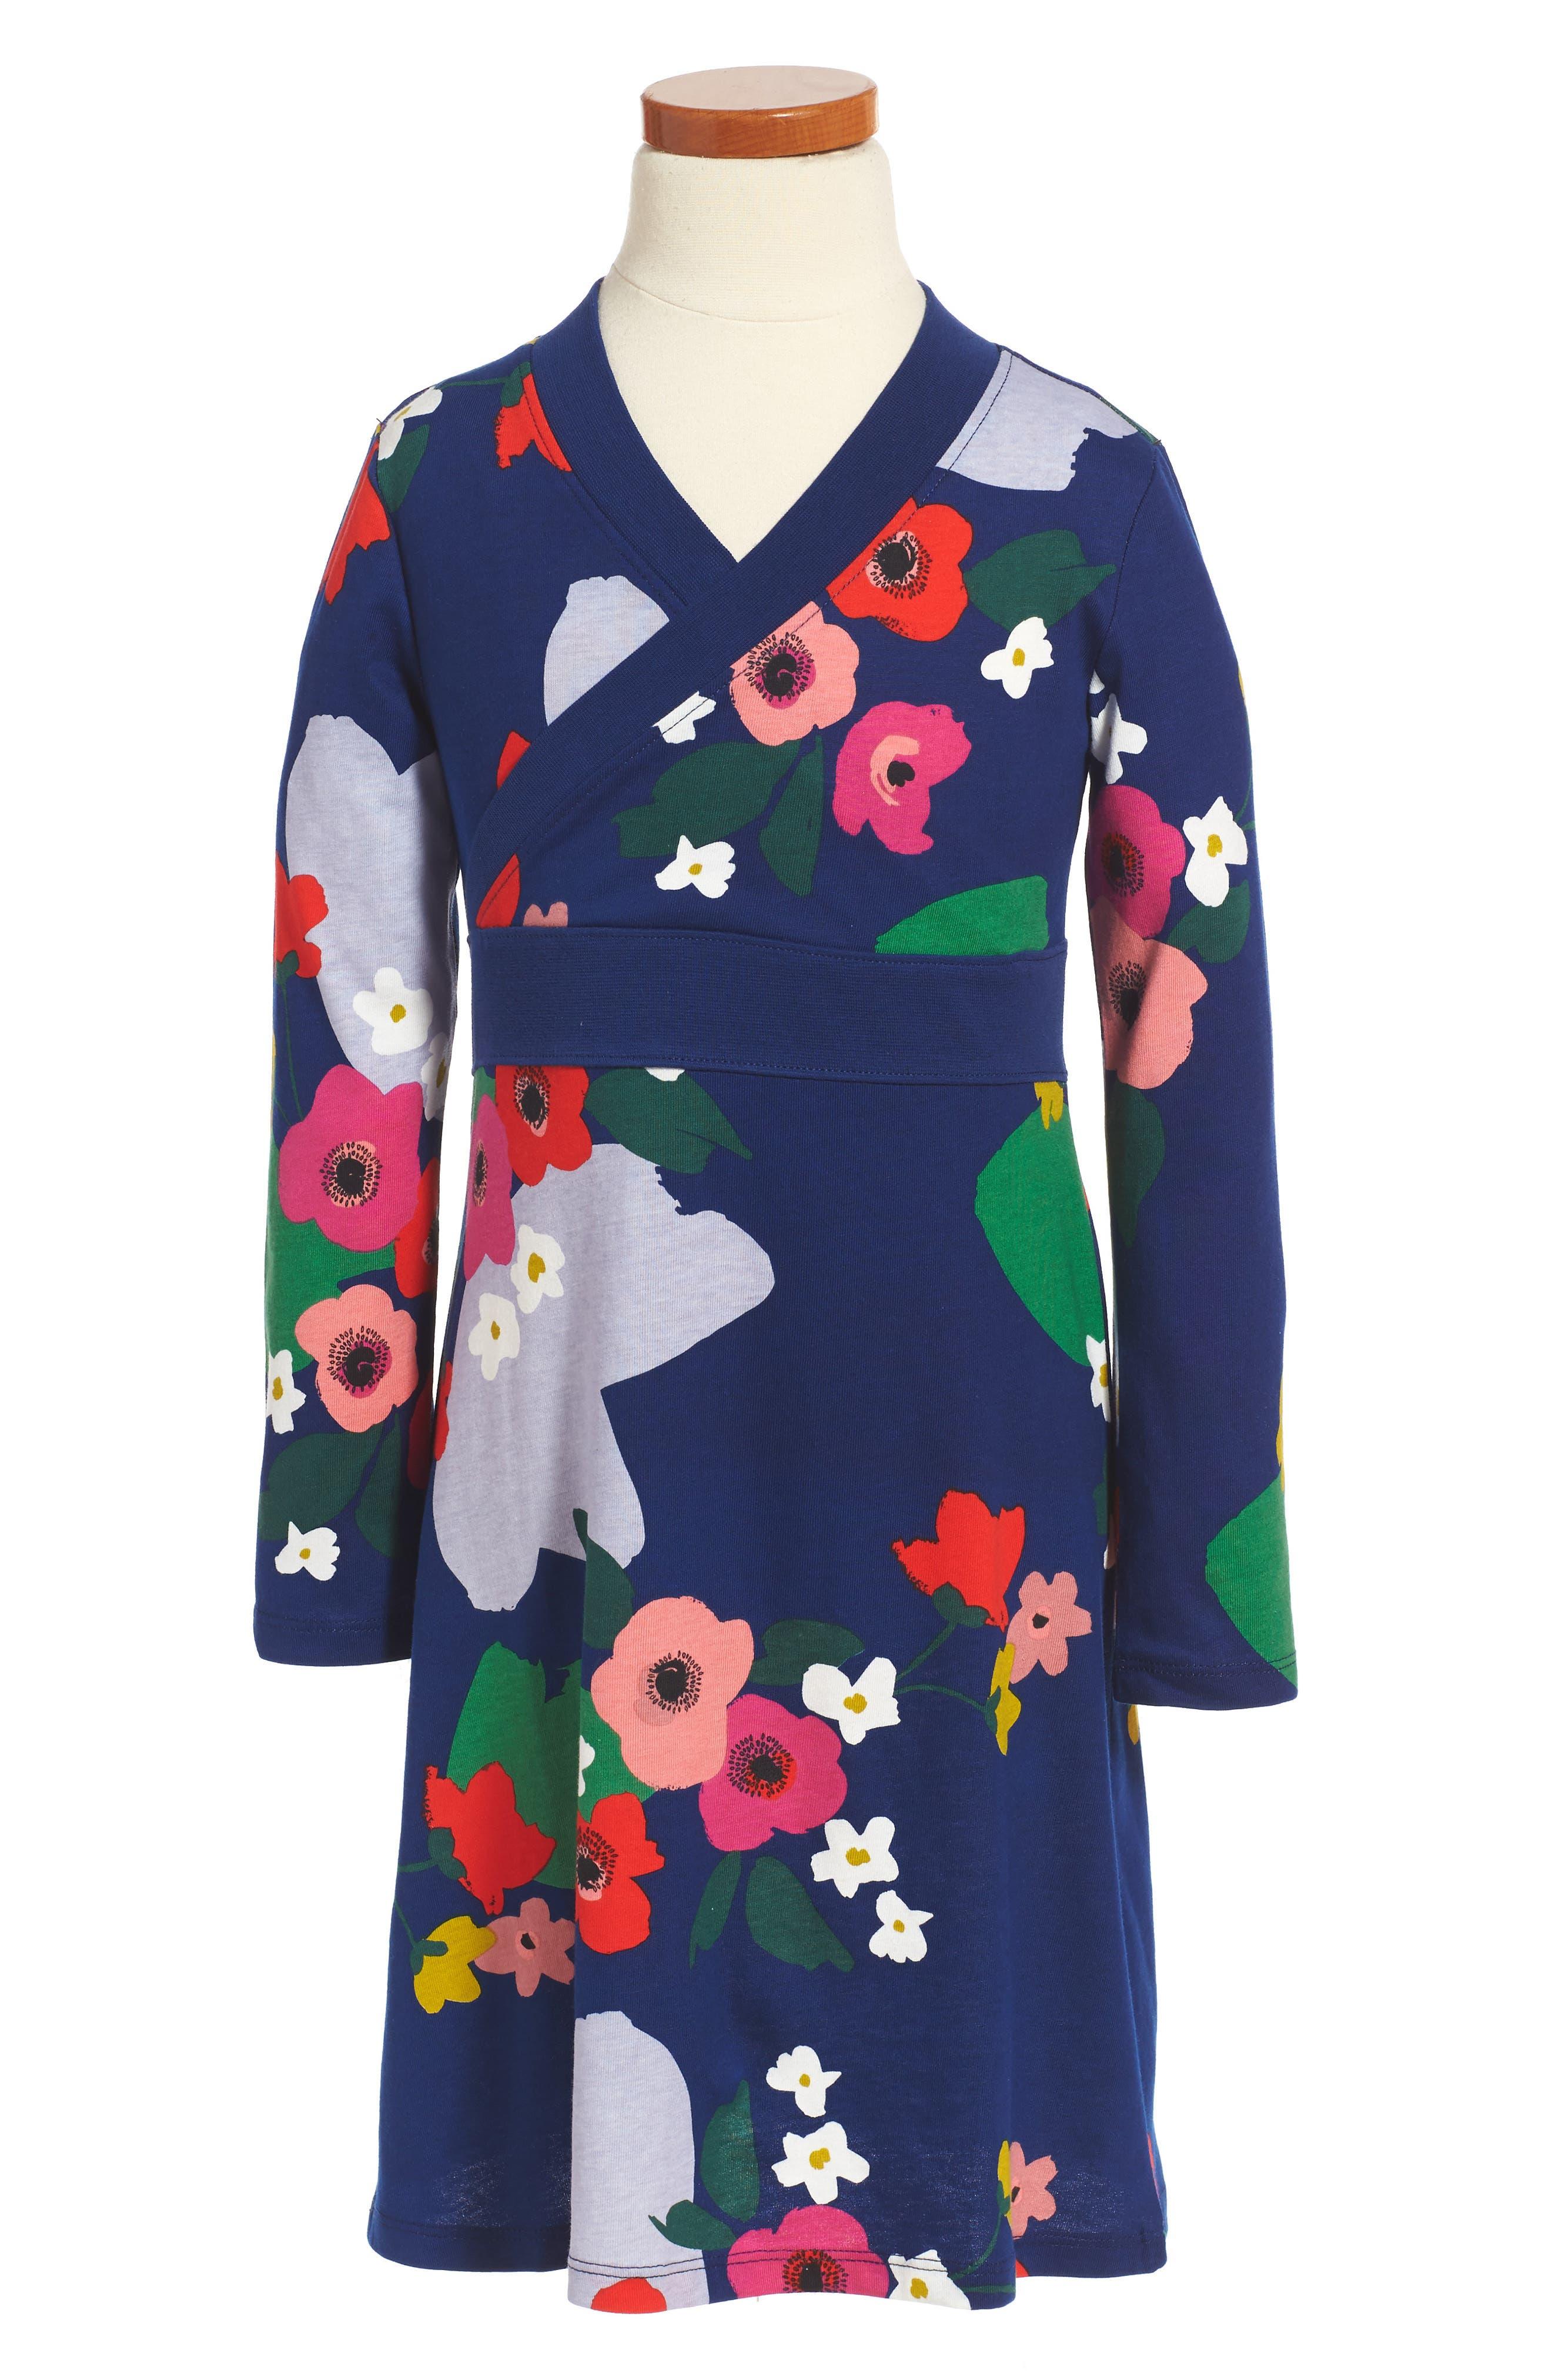 Alternate Image 1 Selected - Tea Collection Scotland Garden Wrap Neck Dress (Toddler Girls, Little Girls & Big Girls)